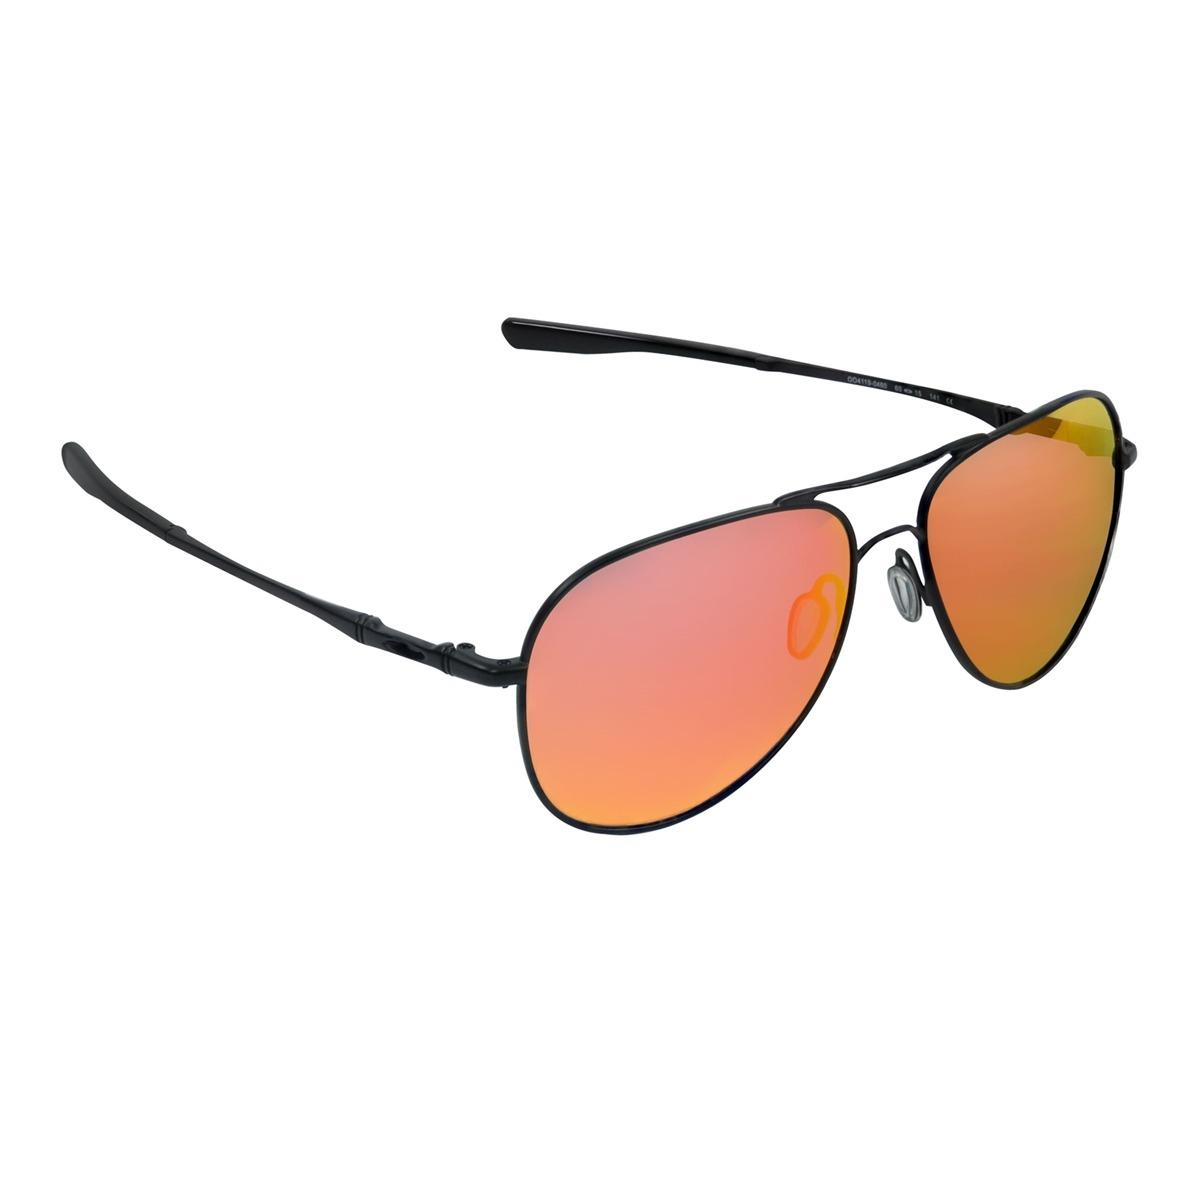 09e95a8a7816f óculos masculino oakley elmont l satin black ruby iridium. Carregando zoom.